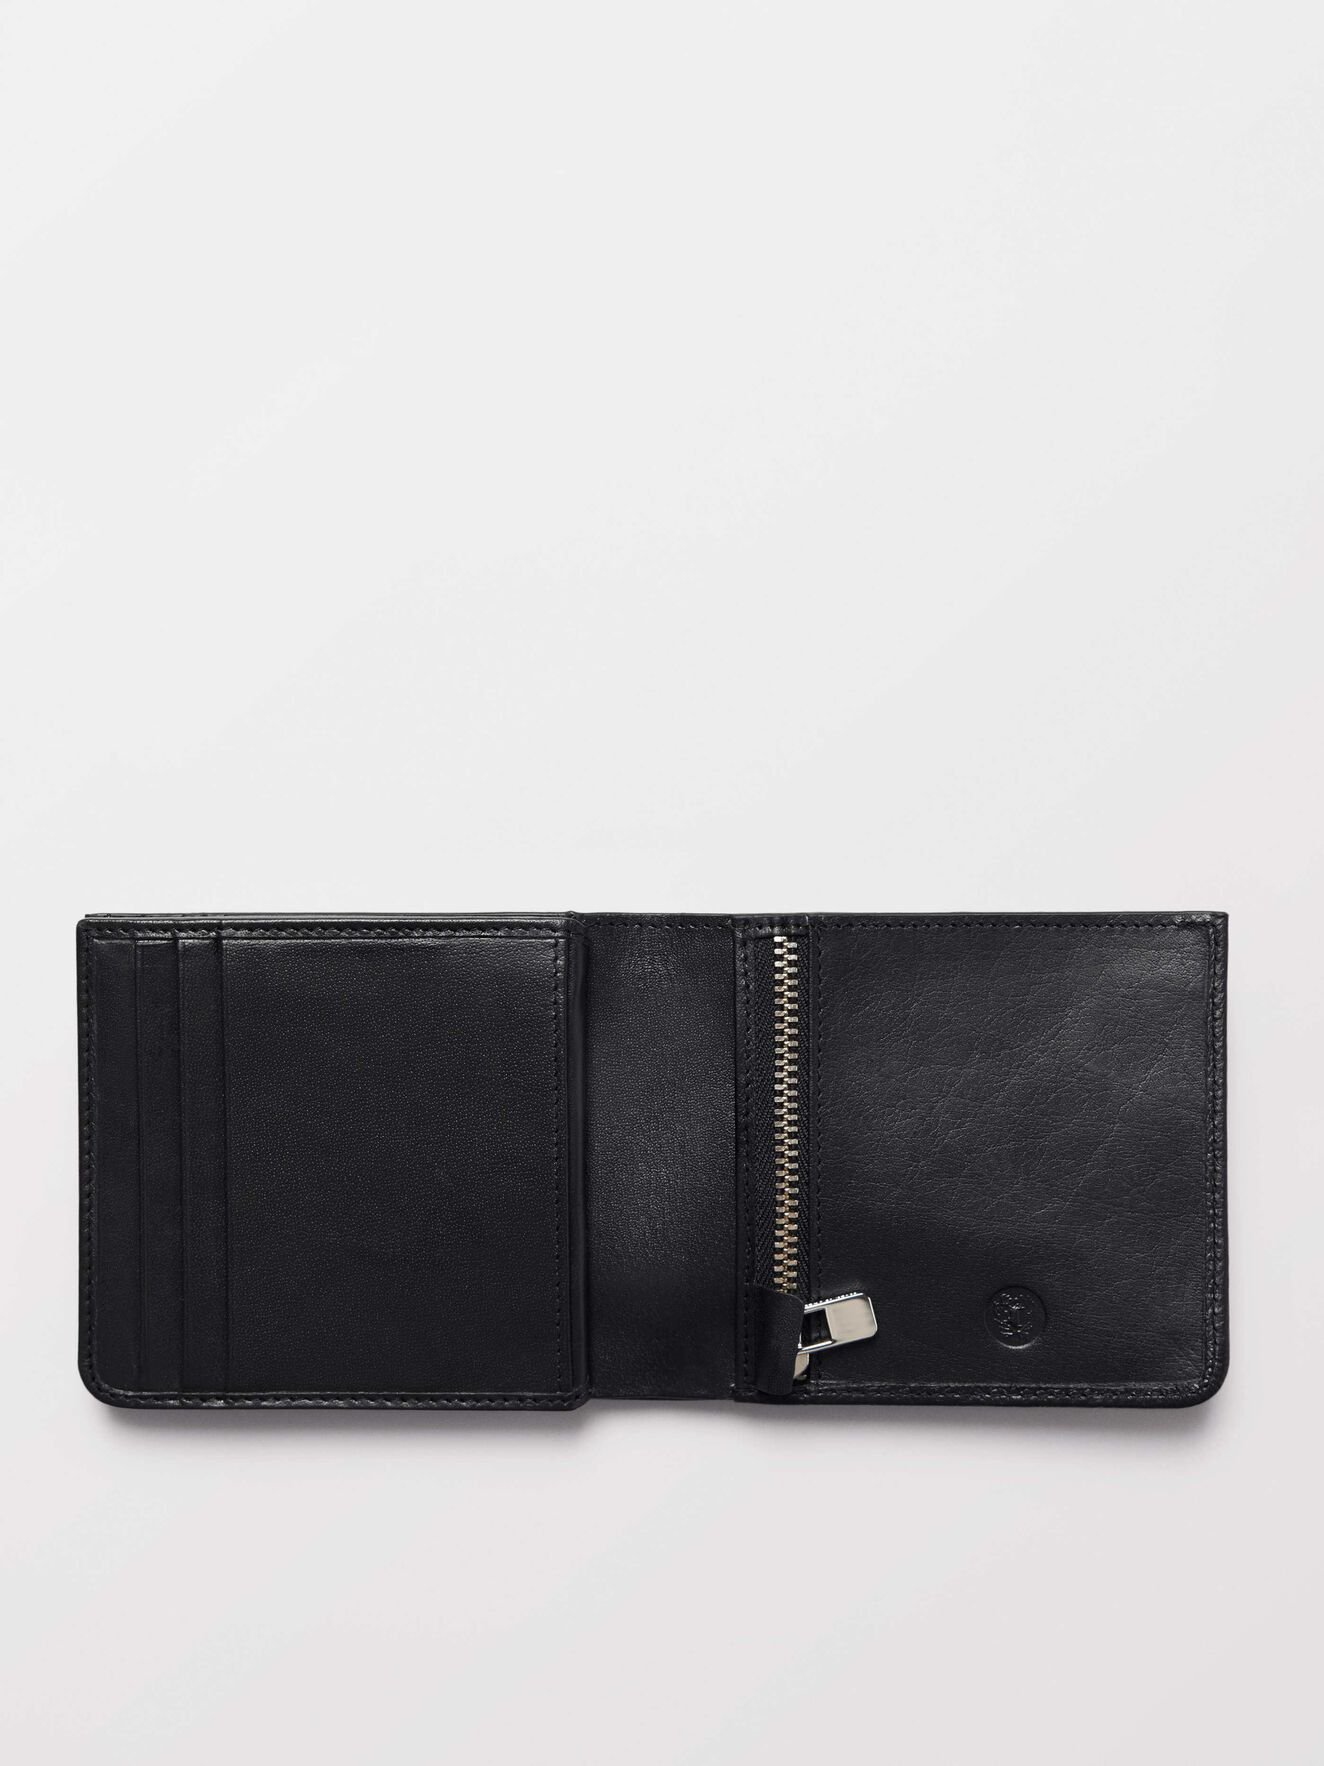 Marvalio Wallet in Black from Tiger of Sweden